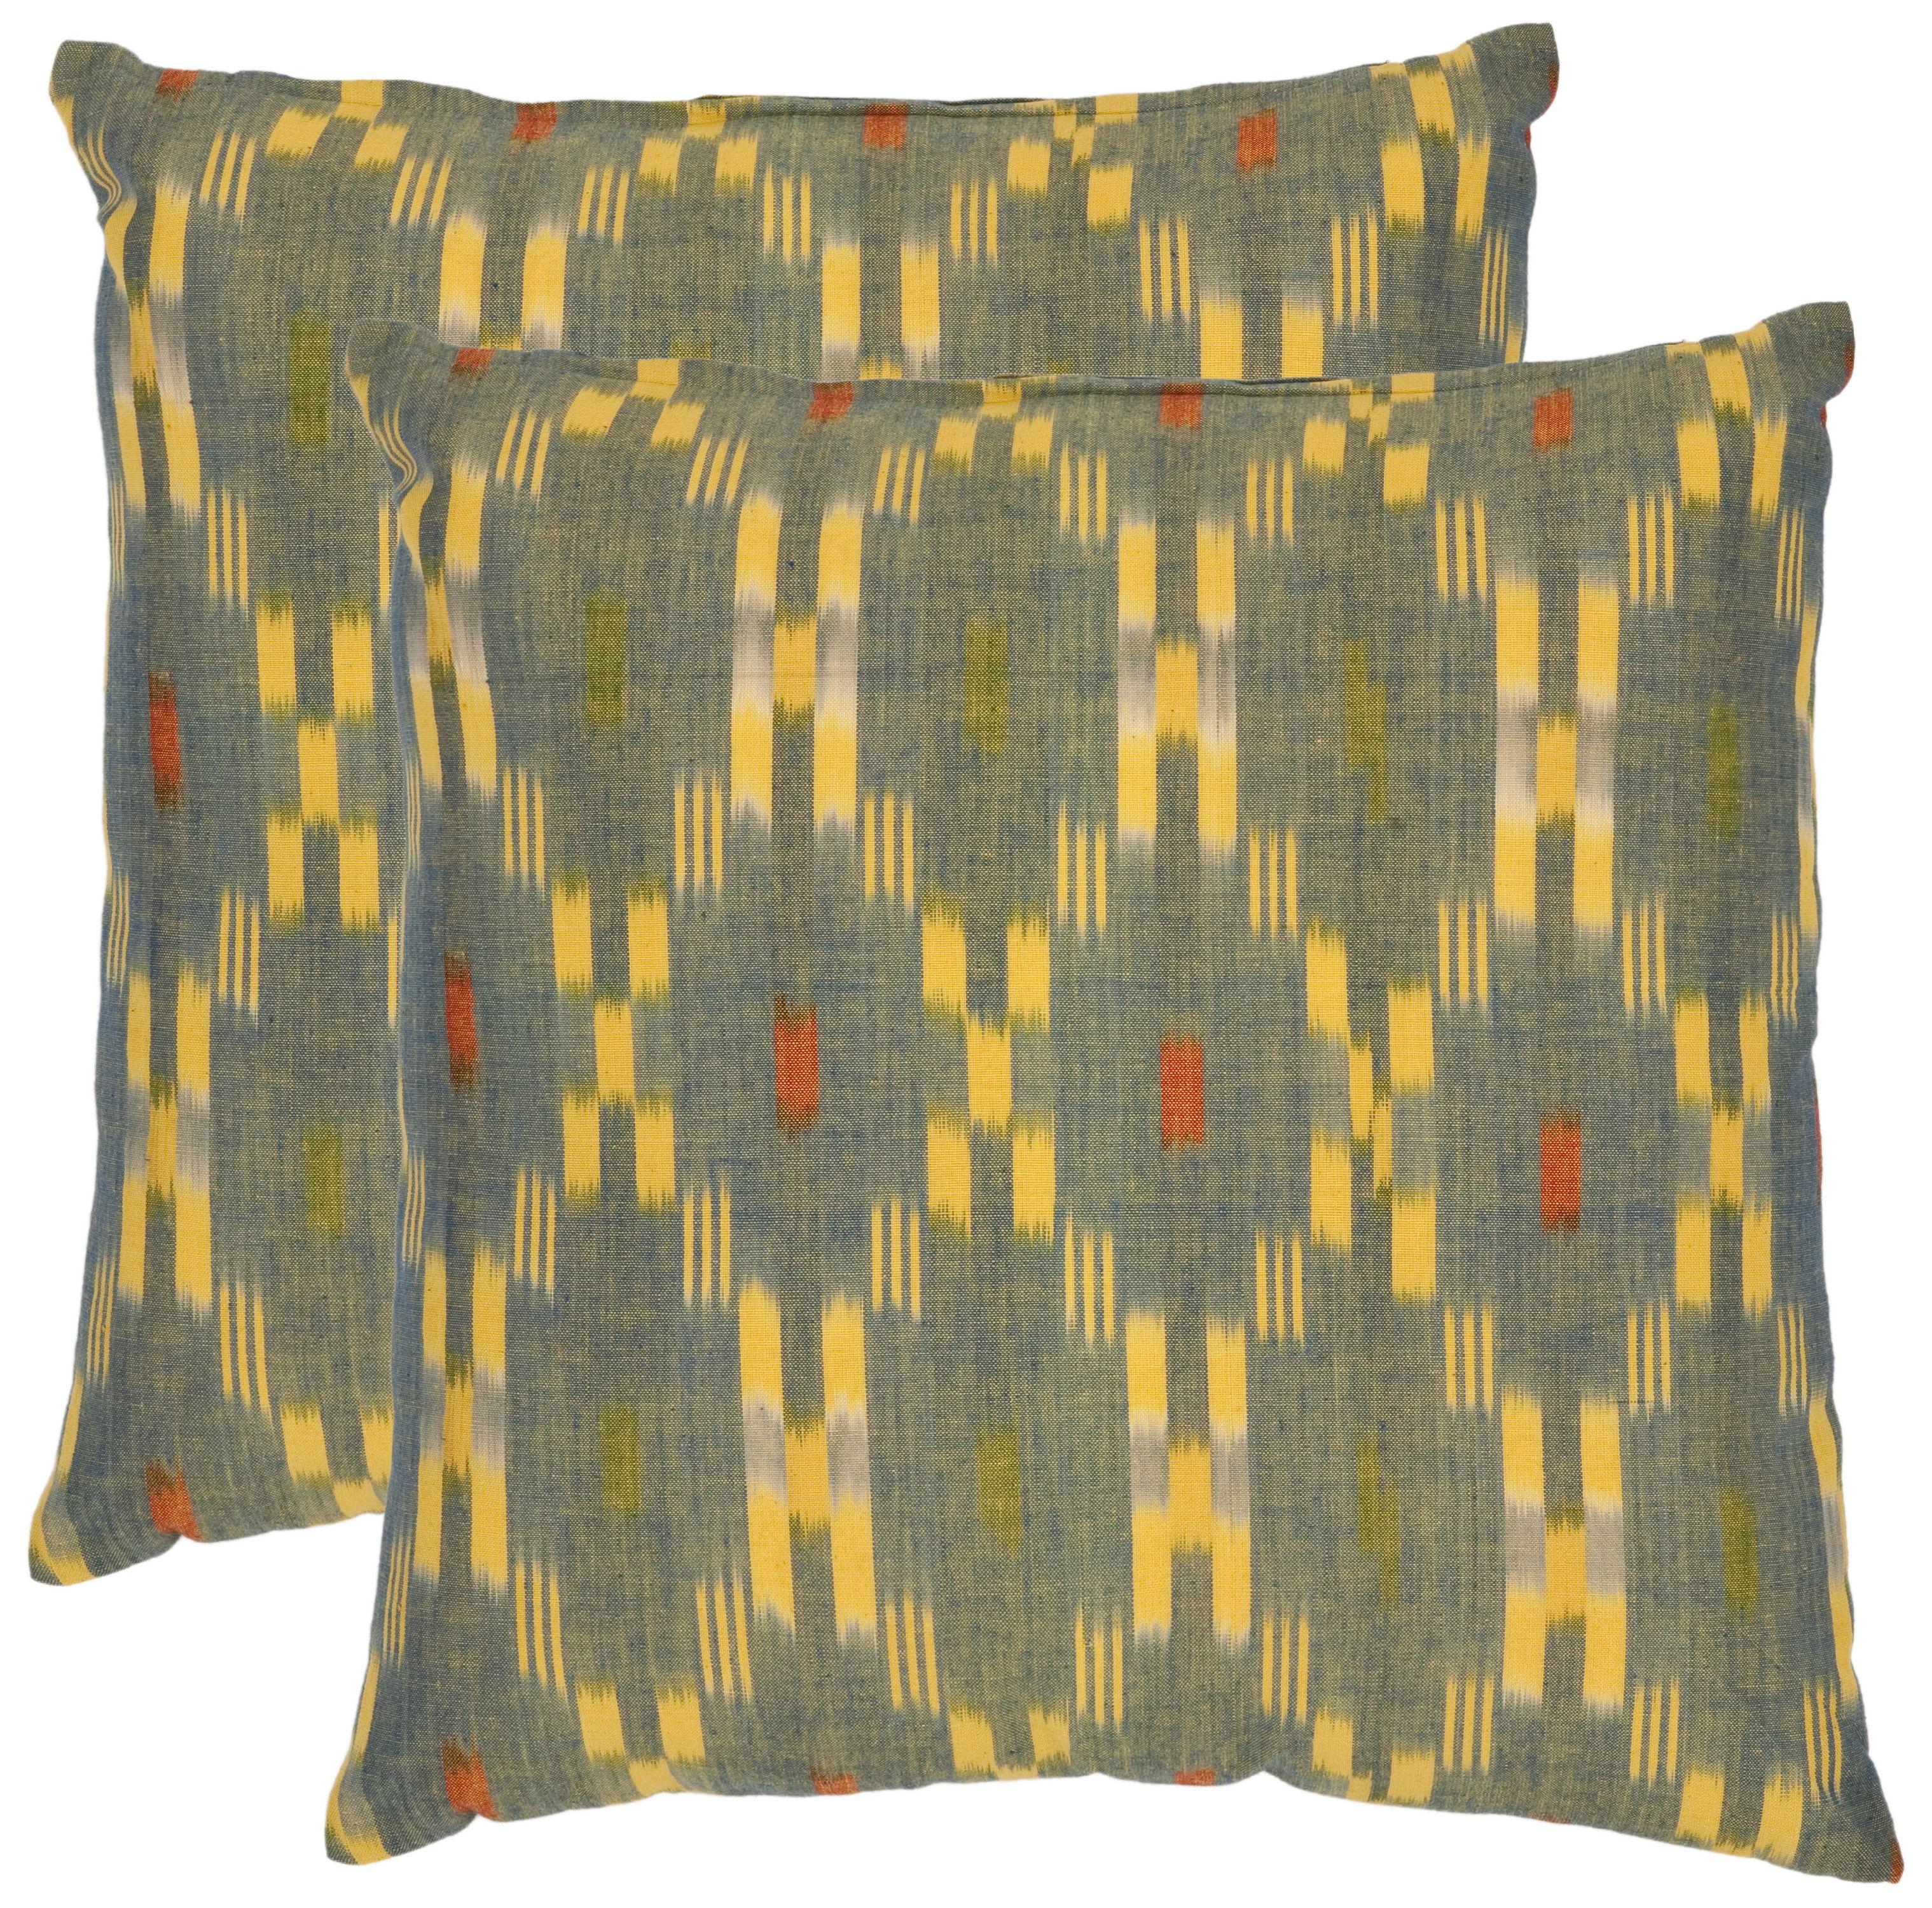 Safavieh Jay Geometric Pillow, Set of 2